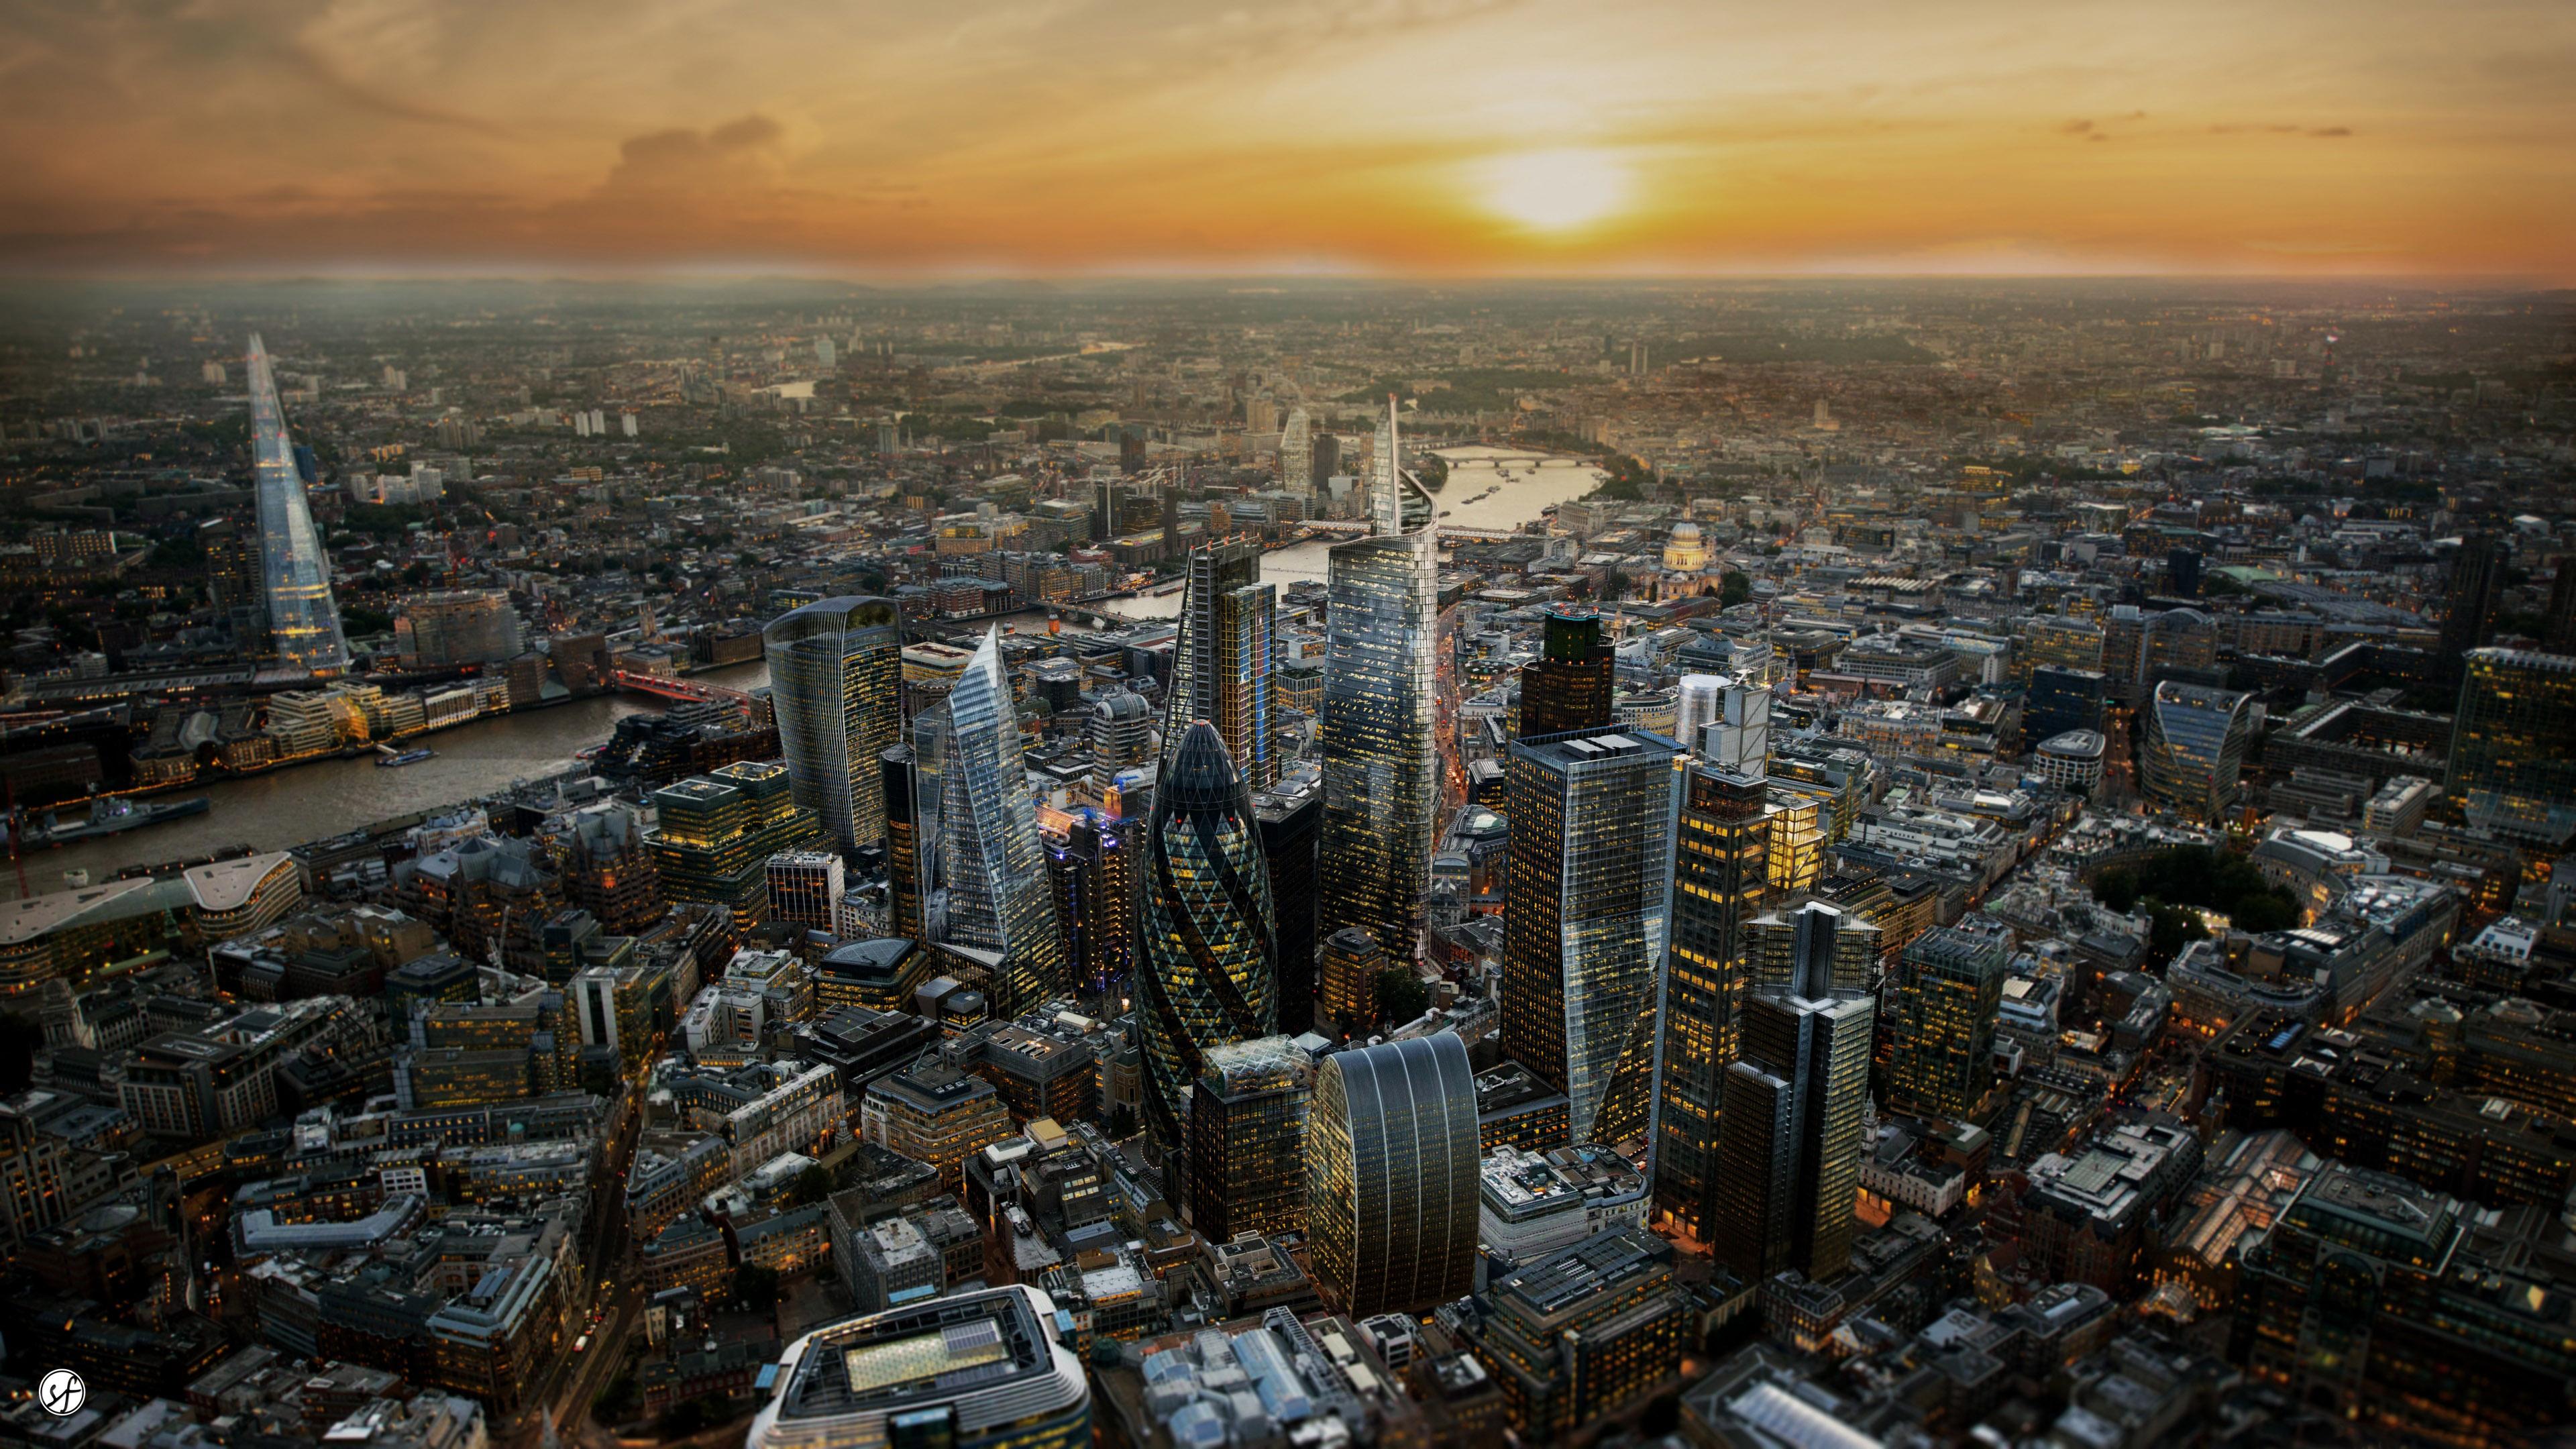 London, England, United Kingdom, skyline at sunset 4K Wallpaper